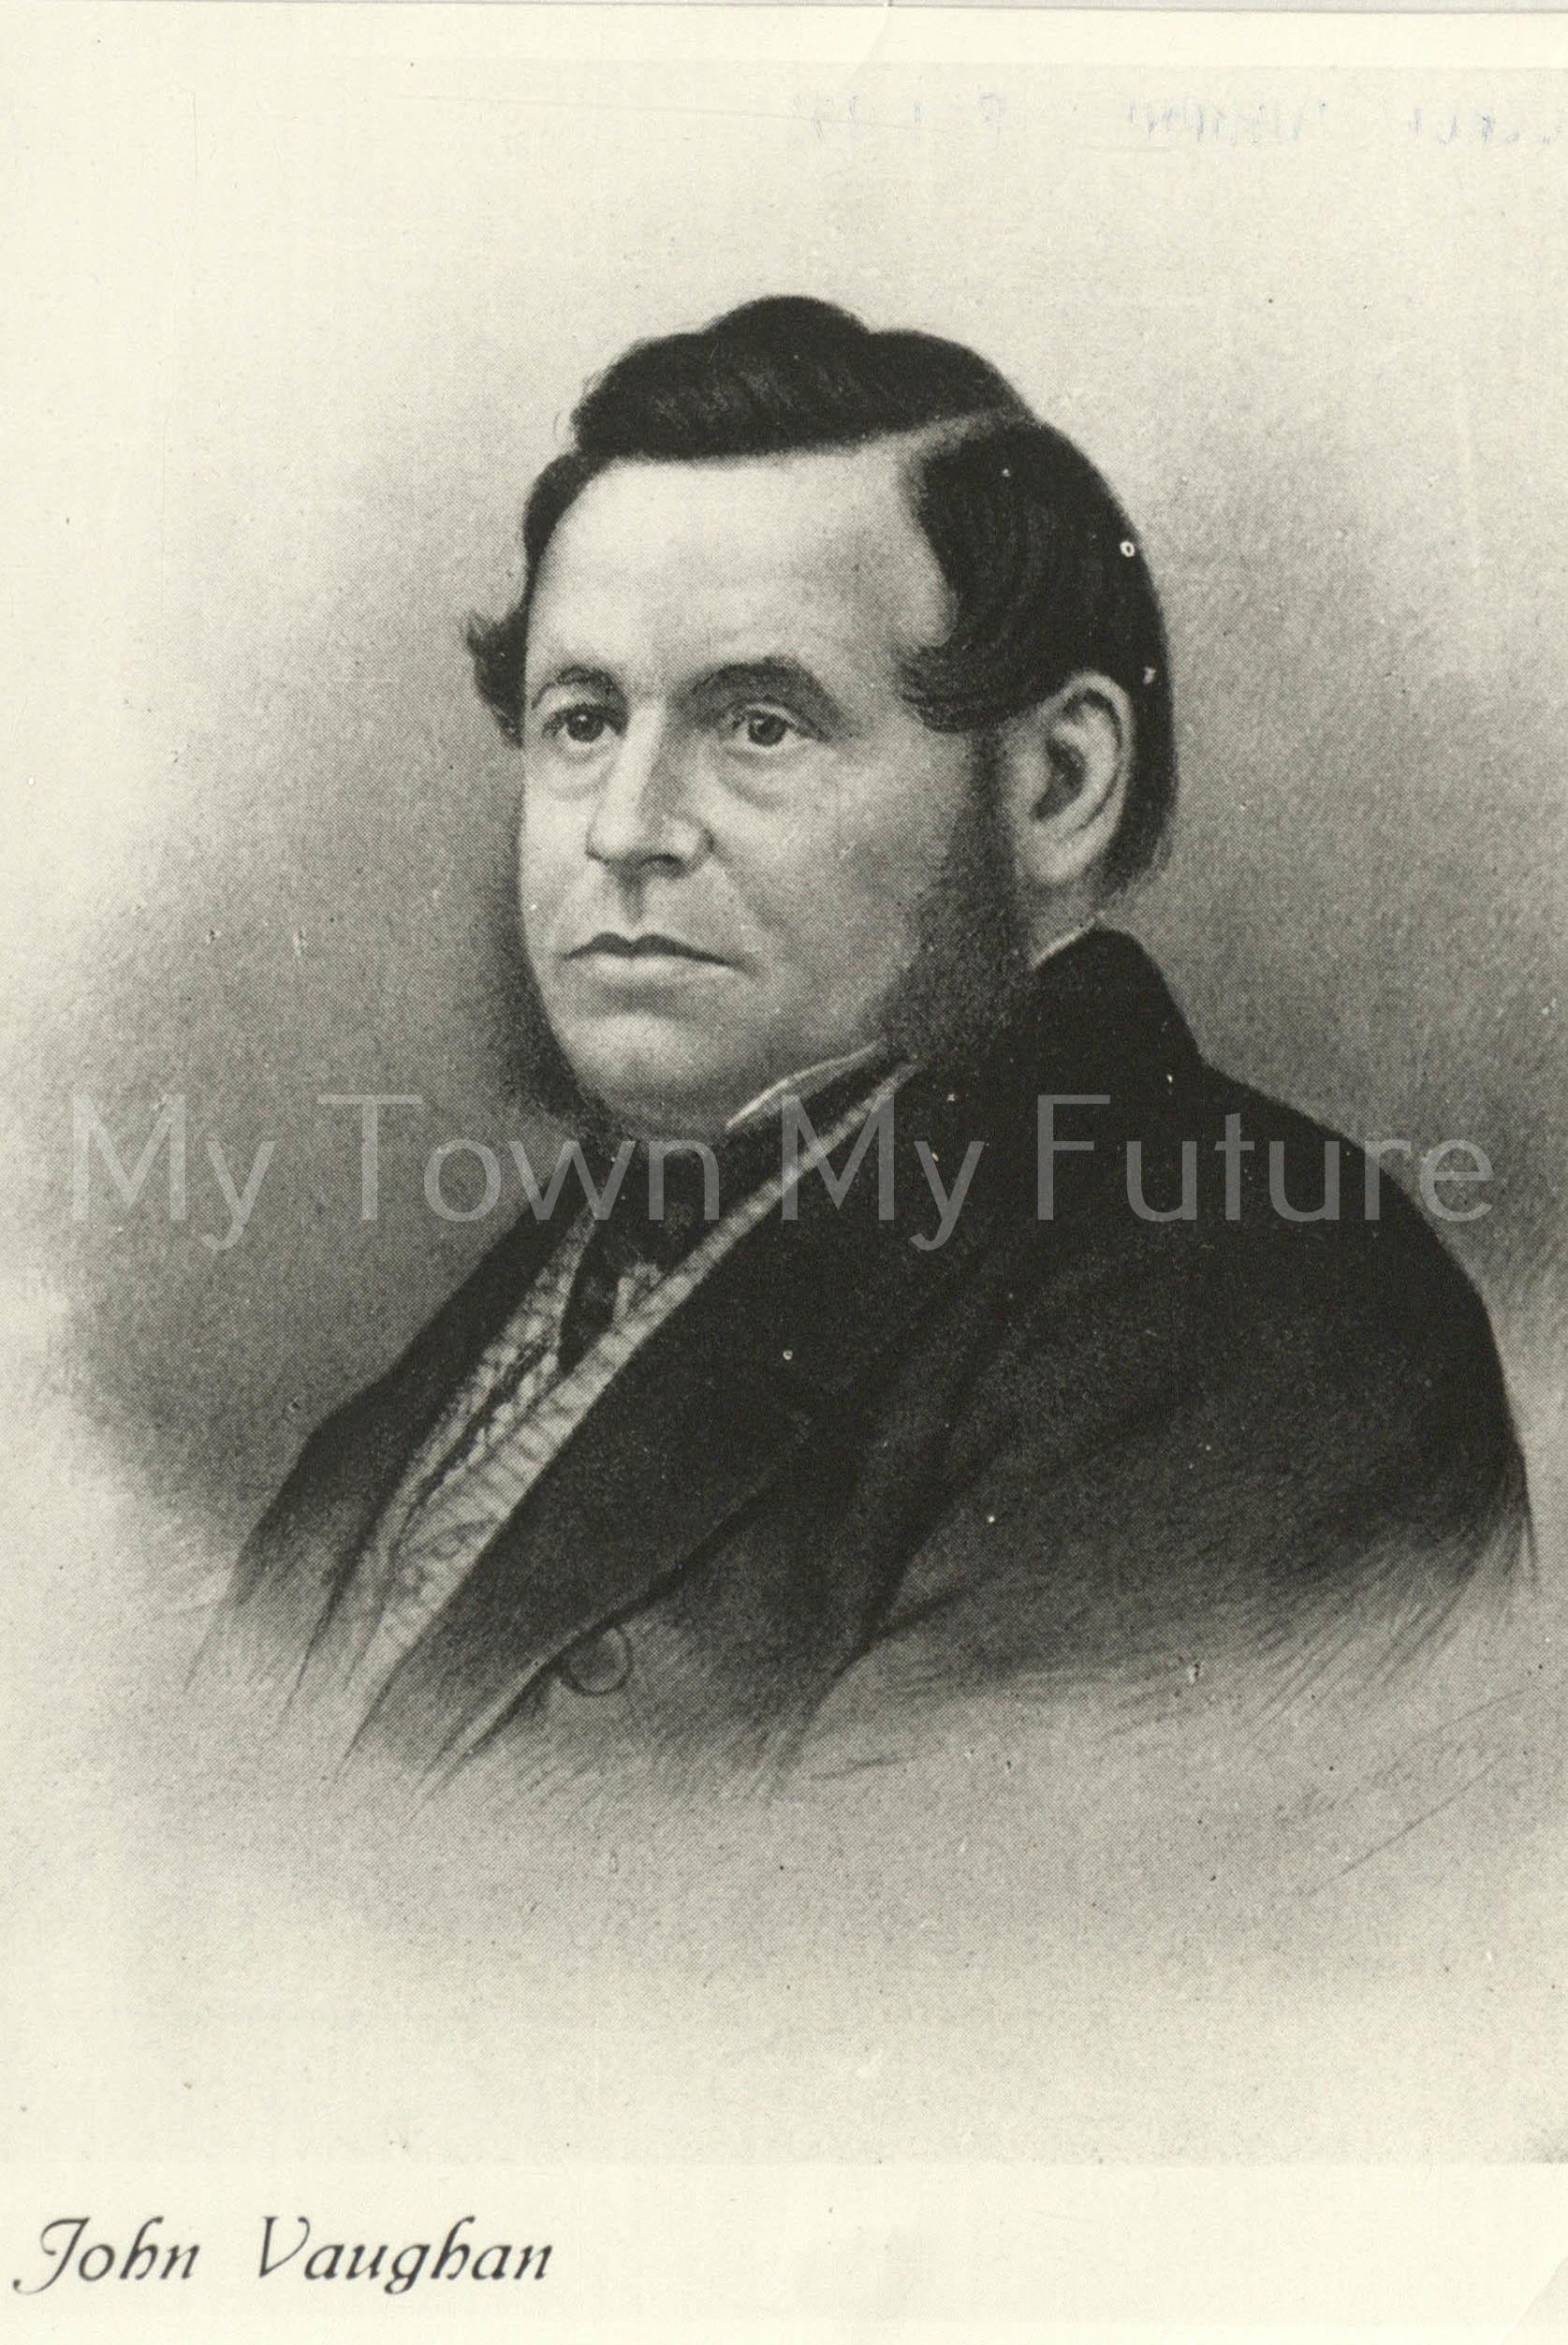 John Vaughn - Dept. of Planning - Cleveland County Council